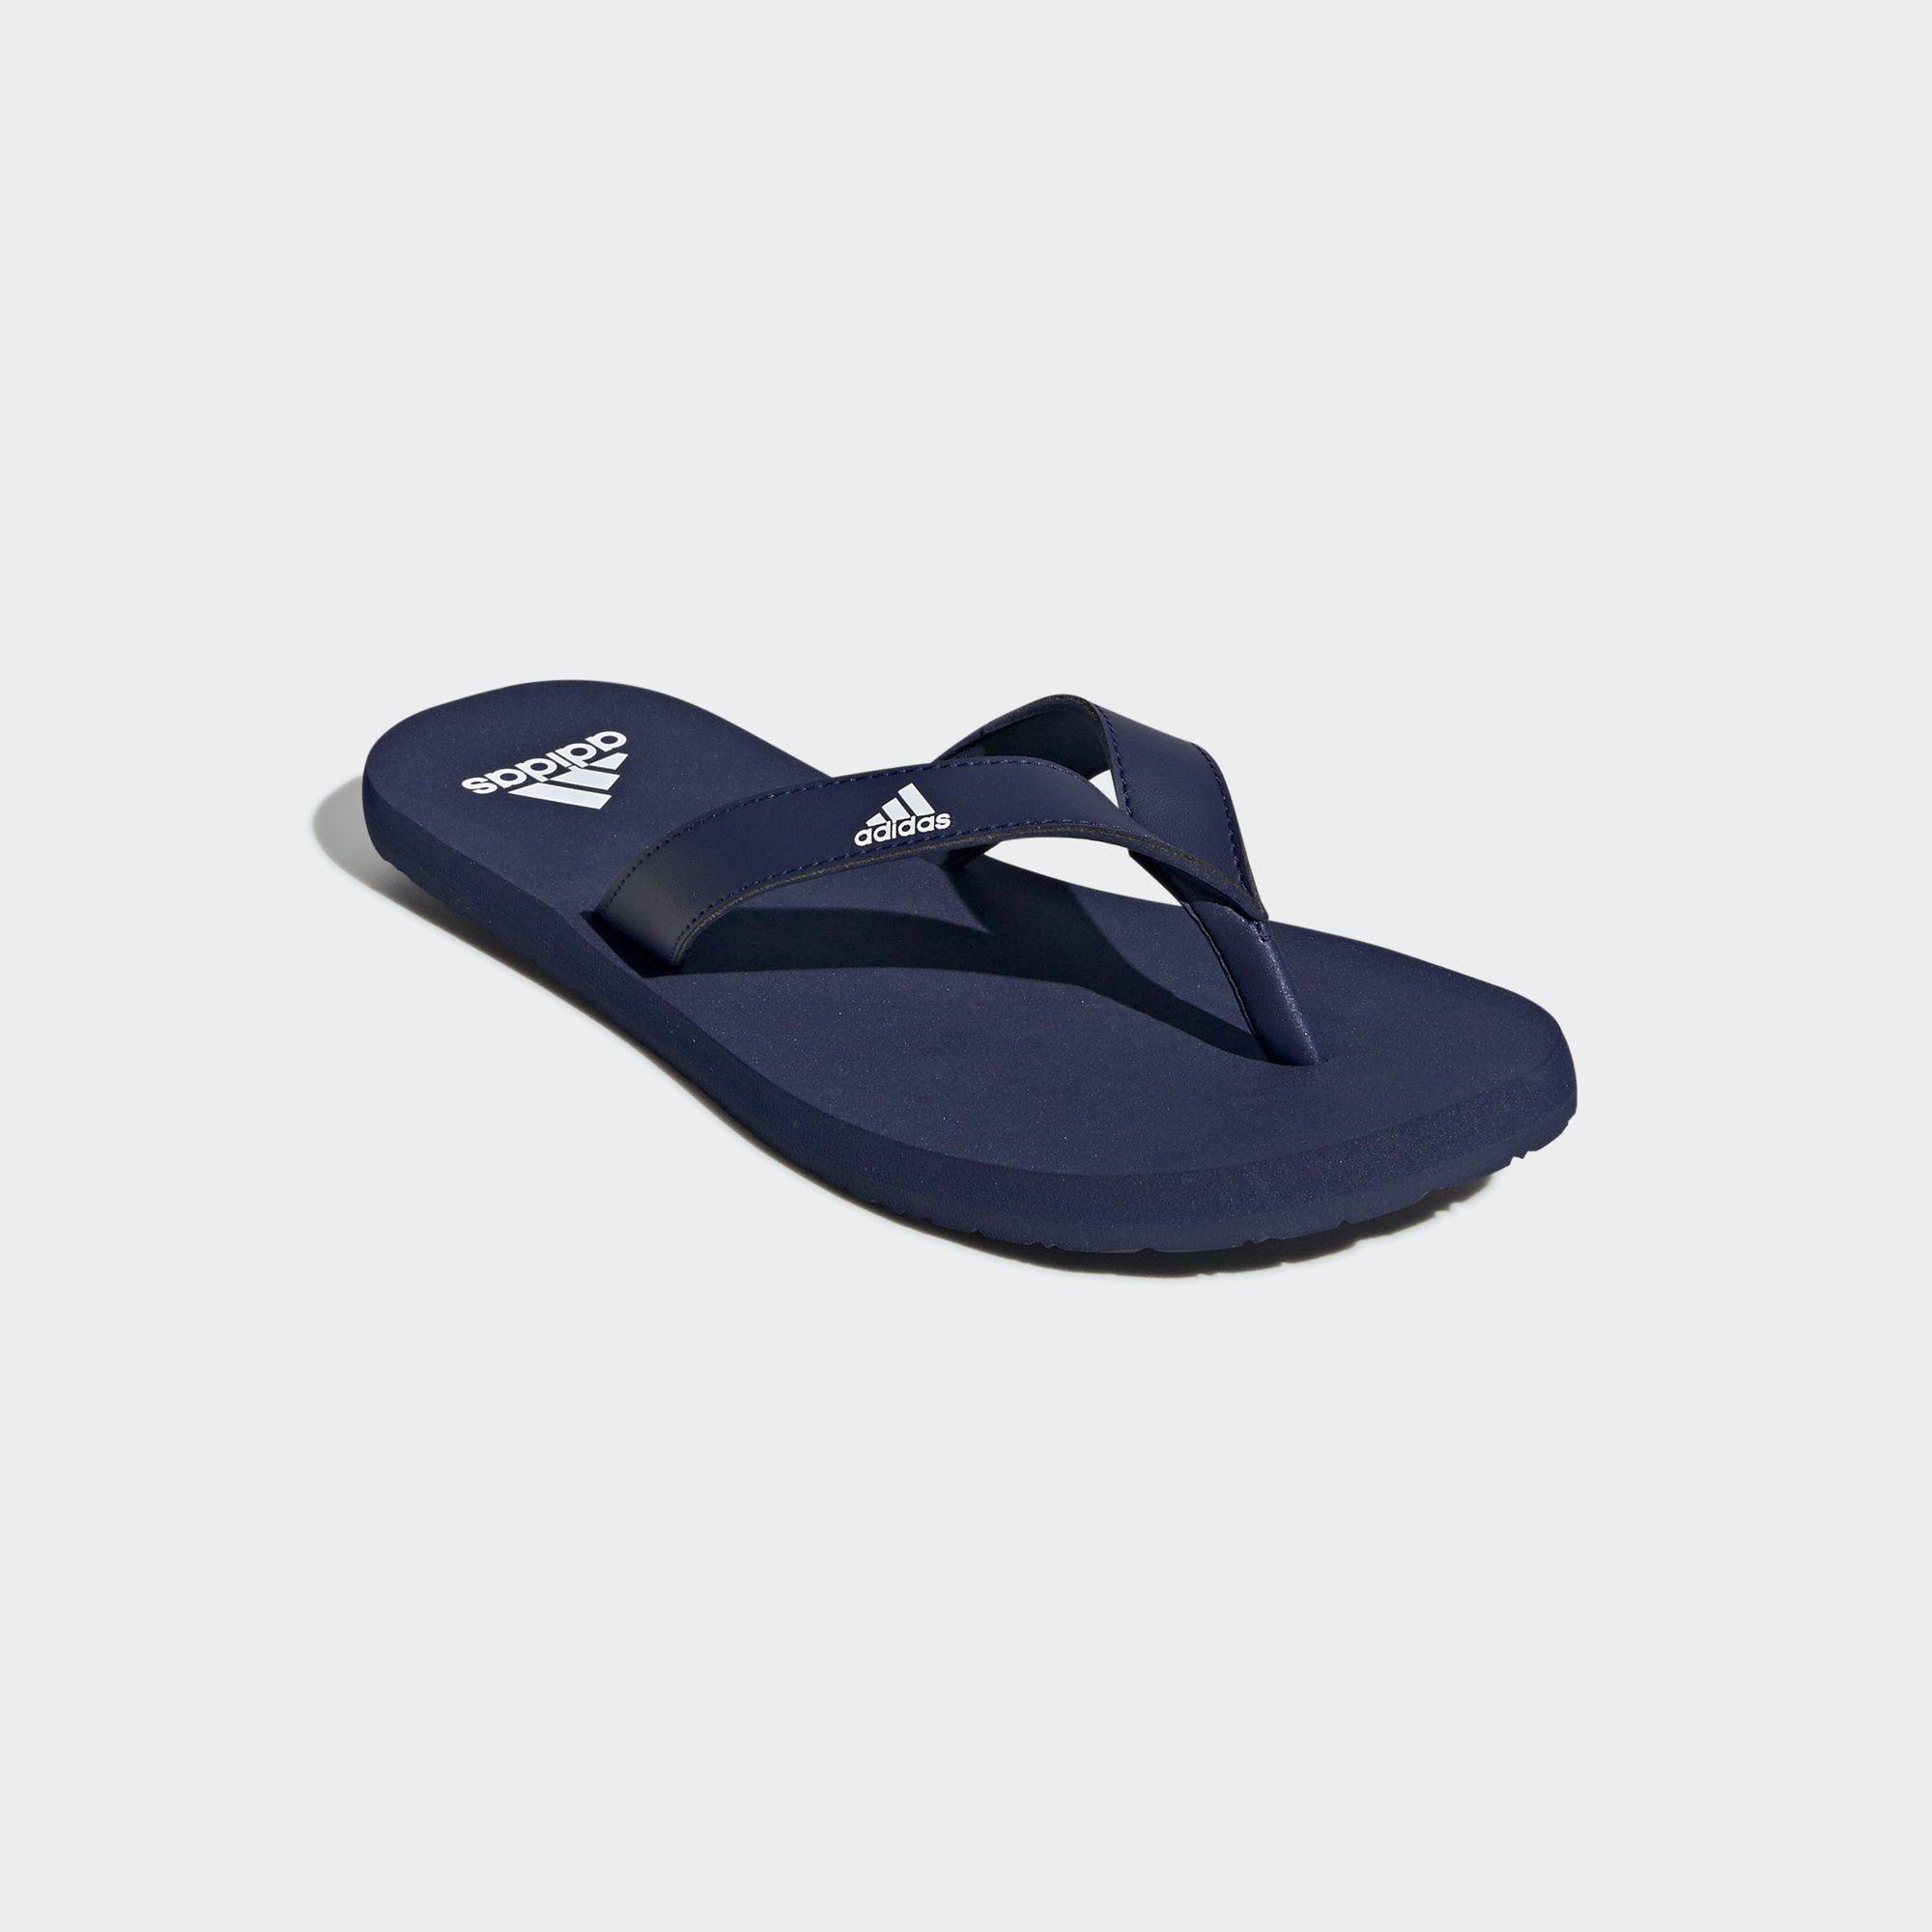 nr Adidas Kaufen Eezay Blue Artikel Performance Zehentrenner 6549772499 Online Badesandale 0qA0Uw4